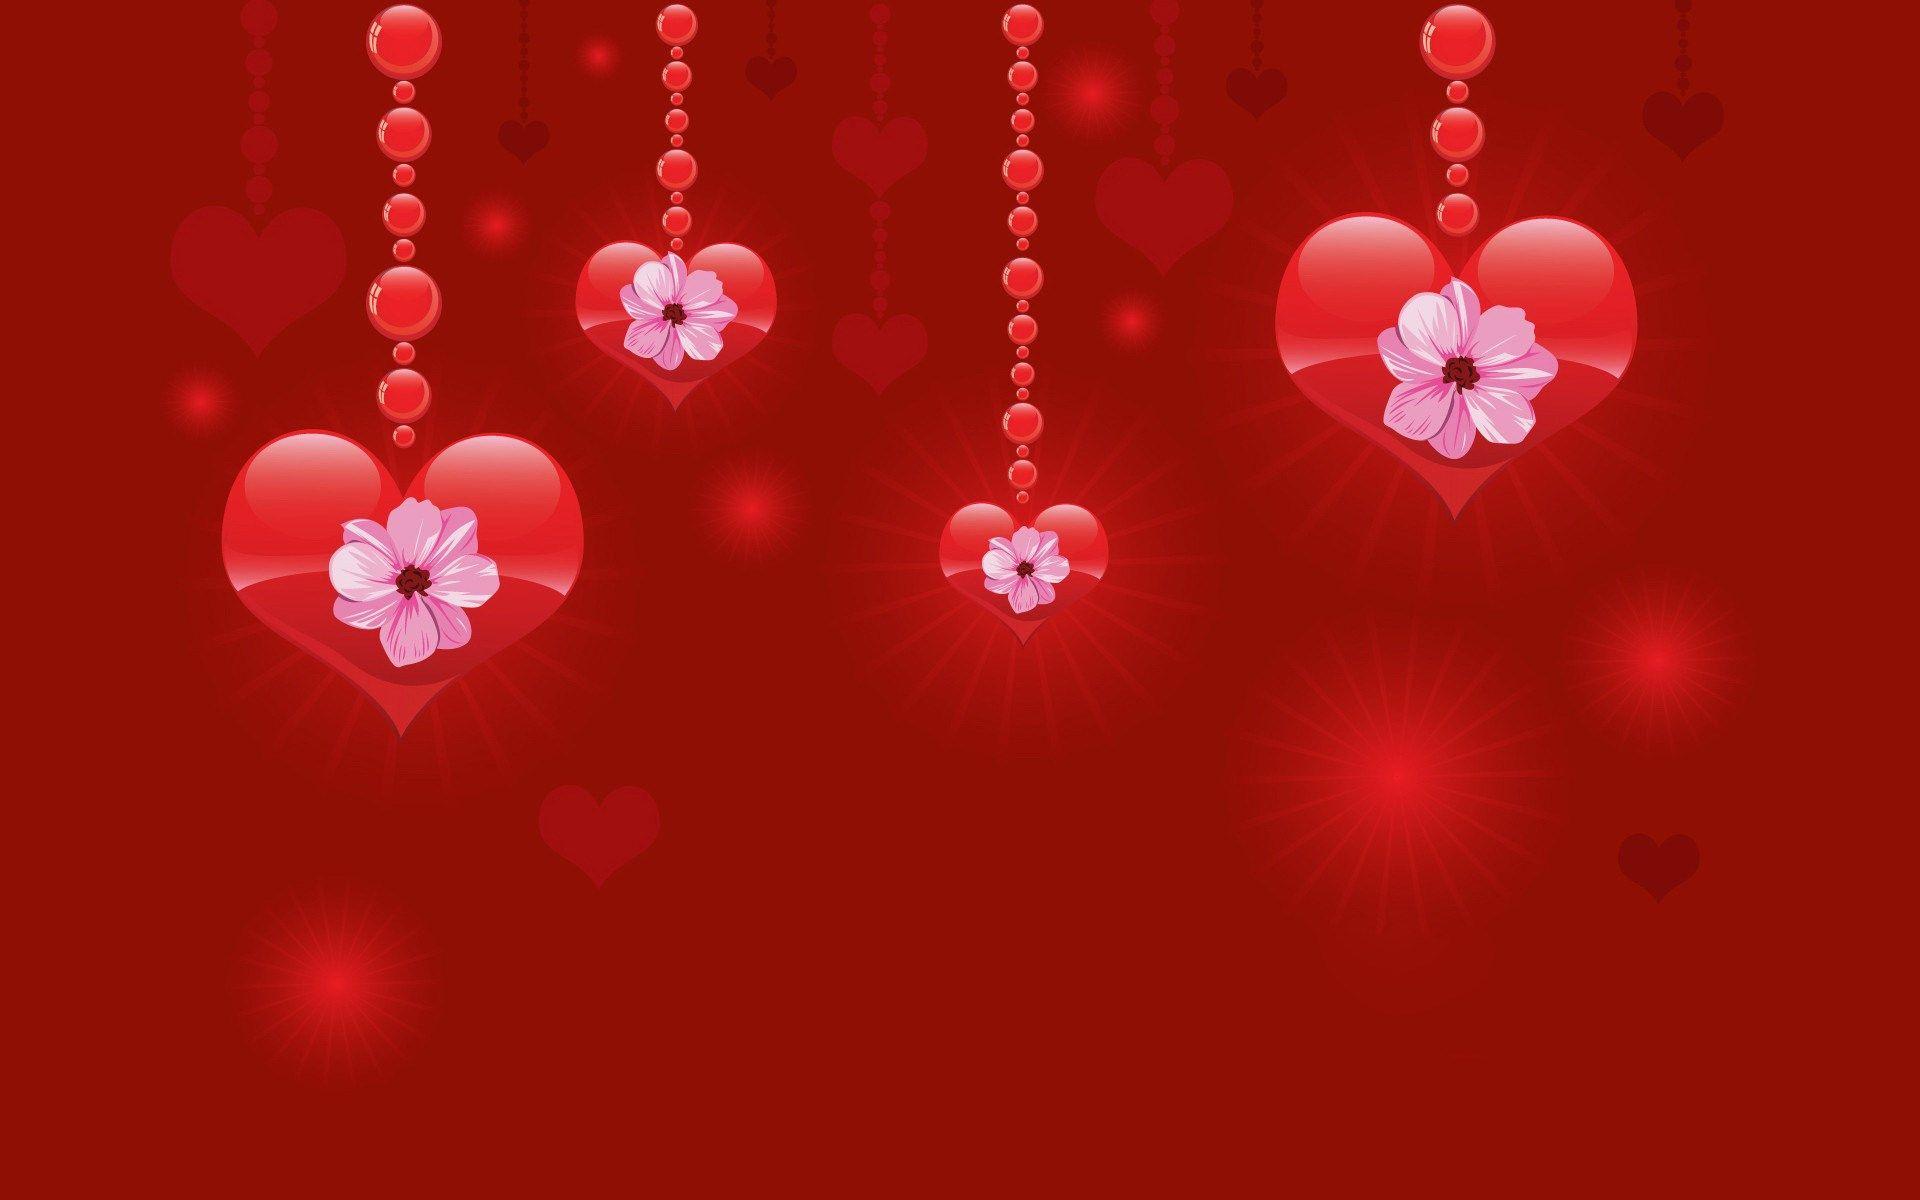 Valentines Desktop Wallpaper On Valentines Day Wallpaper Floral 1920x1200